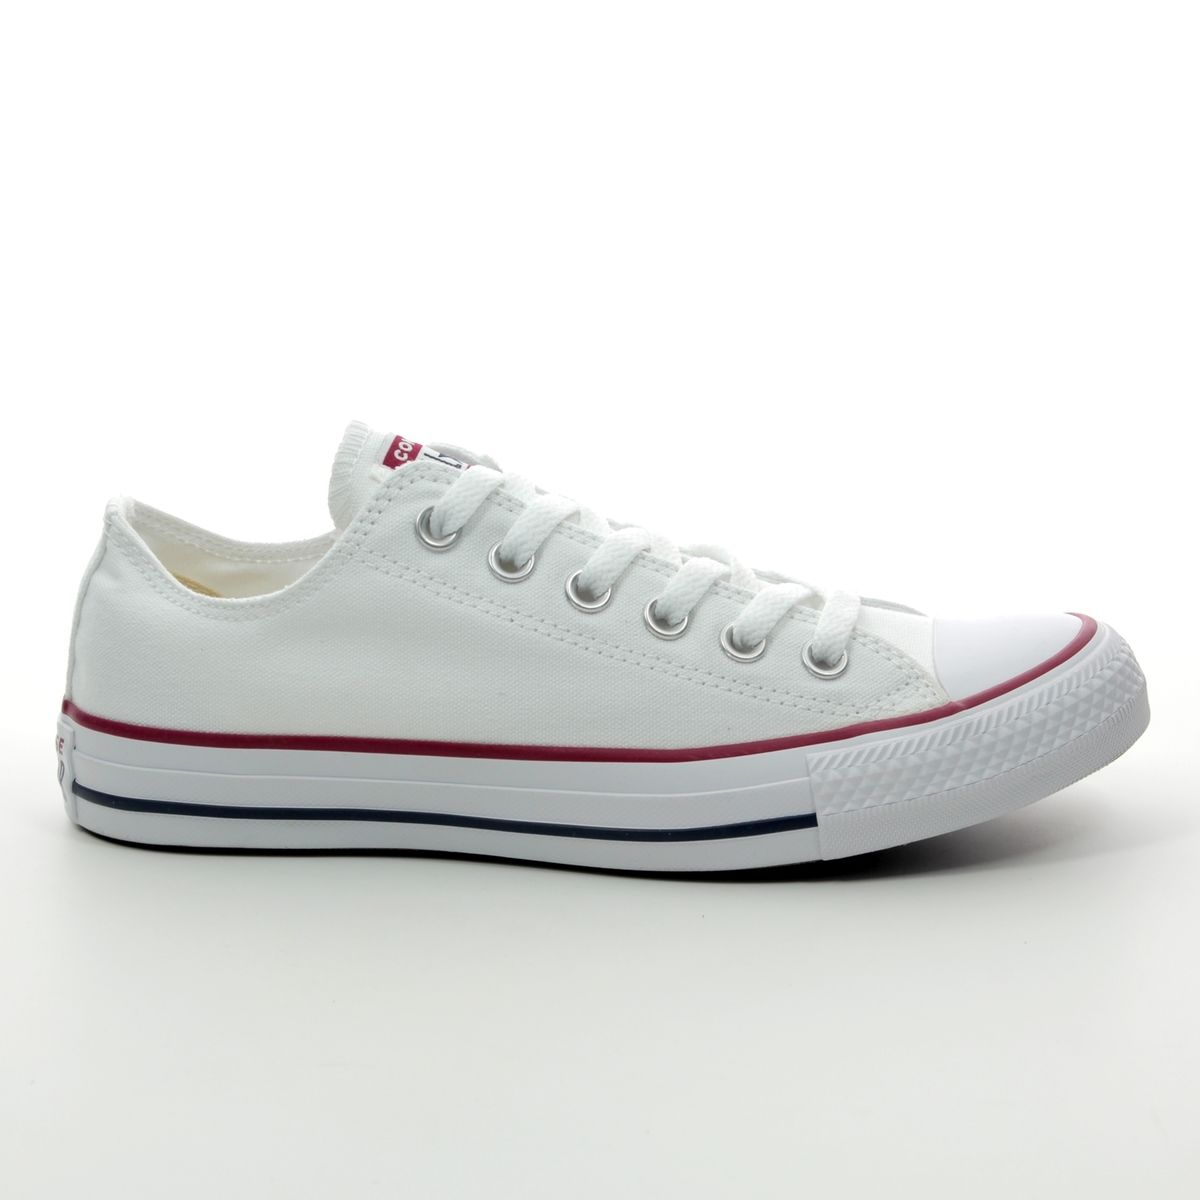 cde1fa901408 Converse Trainers - White - M7652C All Star Ox Classic